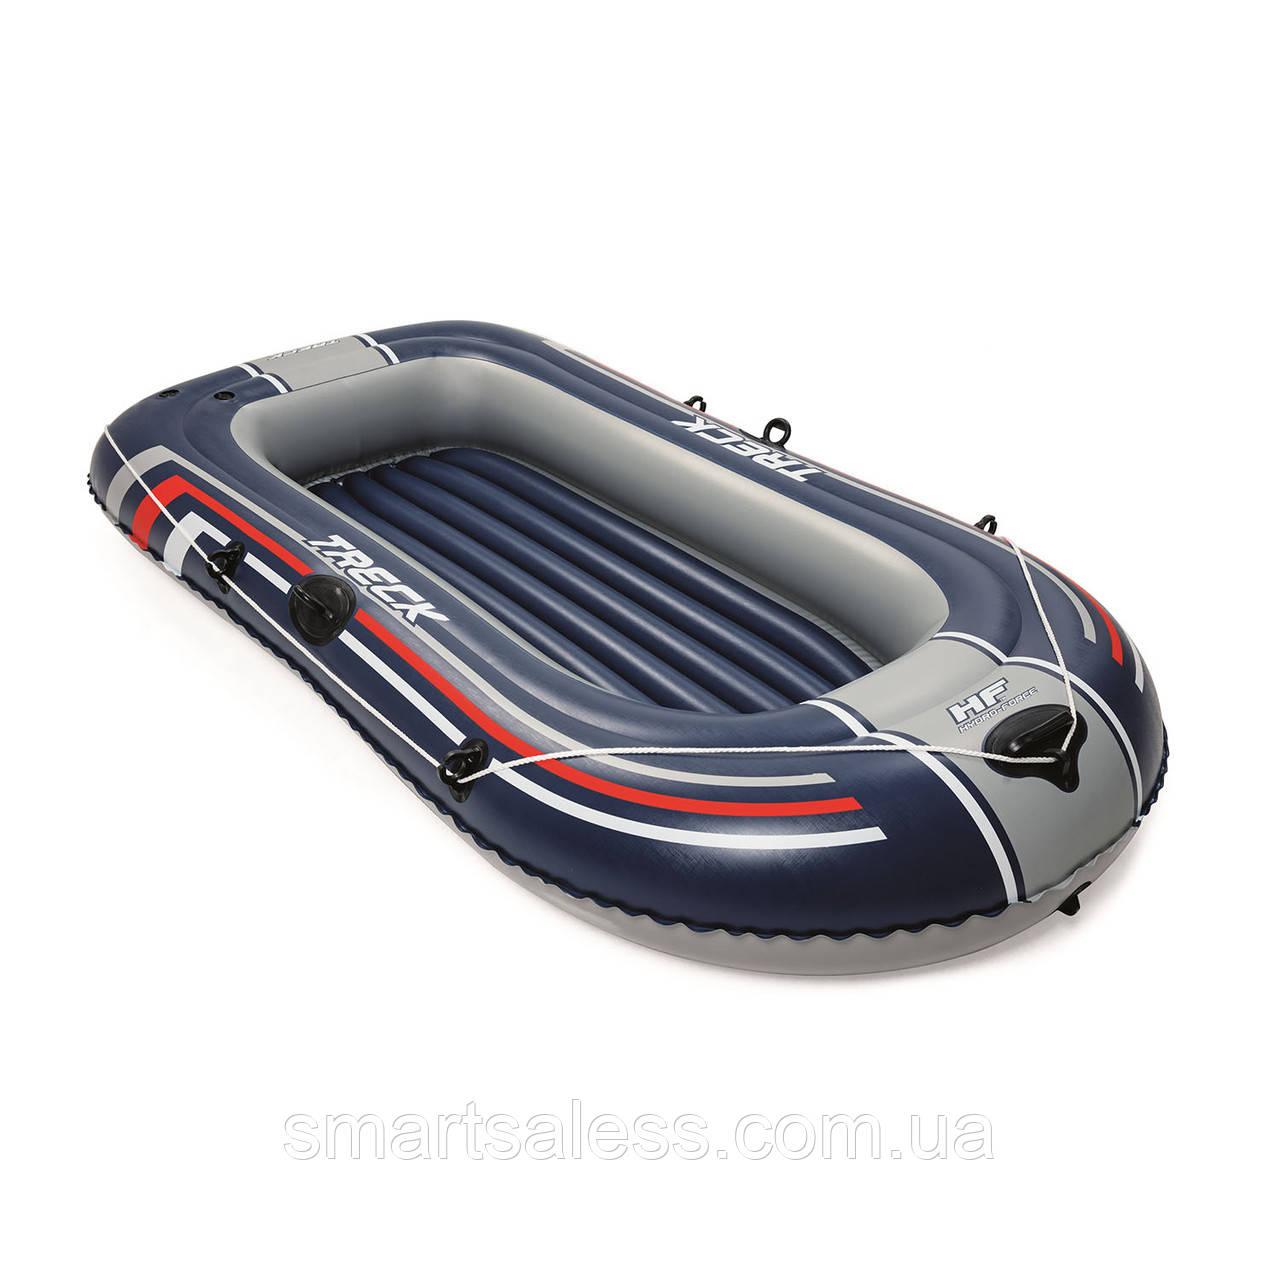 Двухместная надувная лодка Bestway 61064 Hydro - Force Raft, синяя, 228 х 121 см